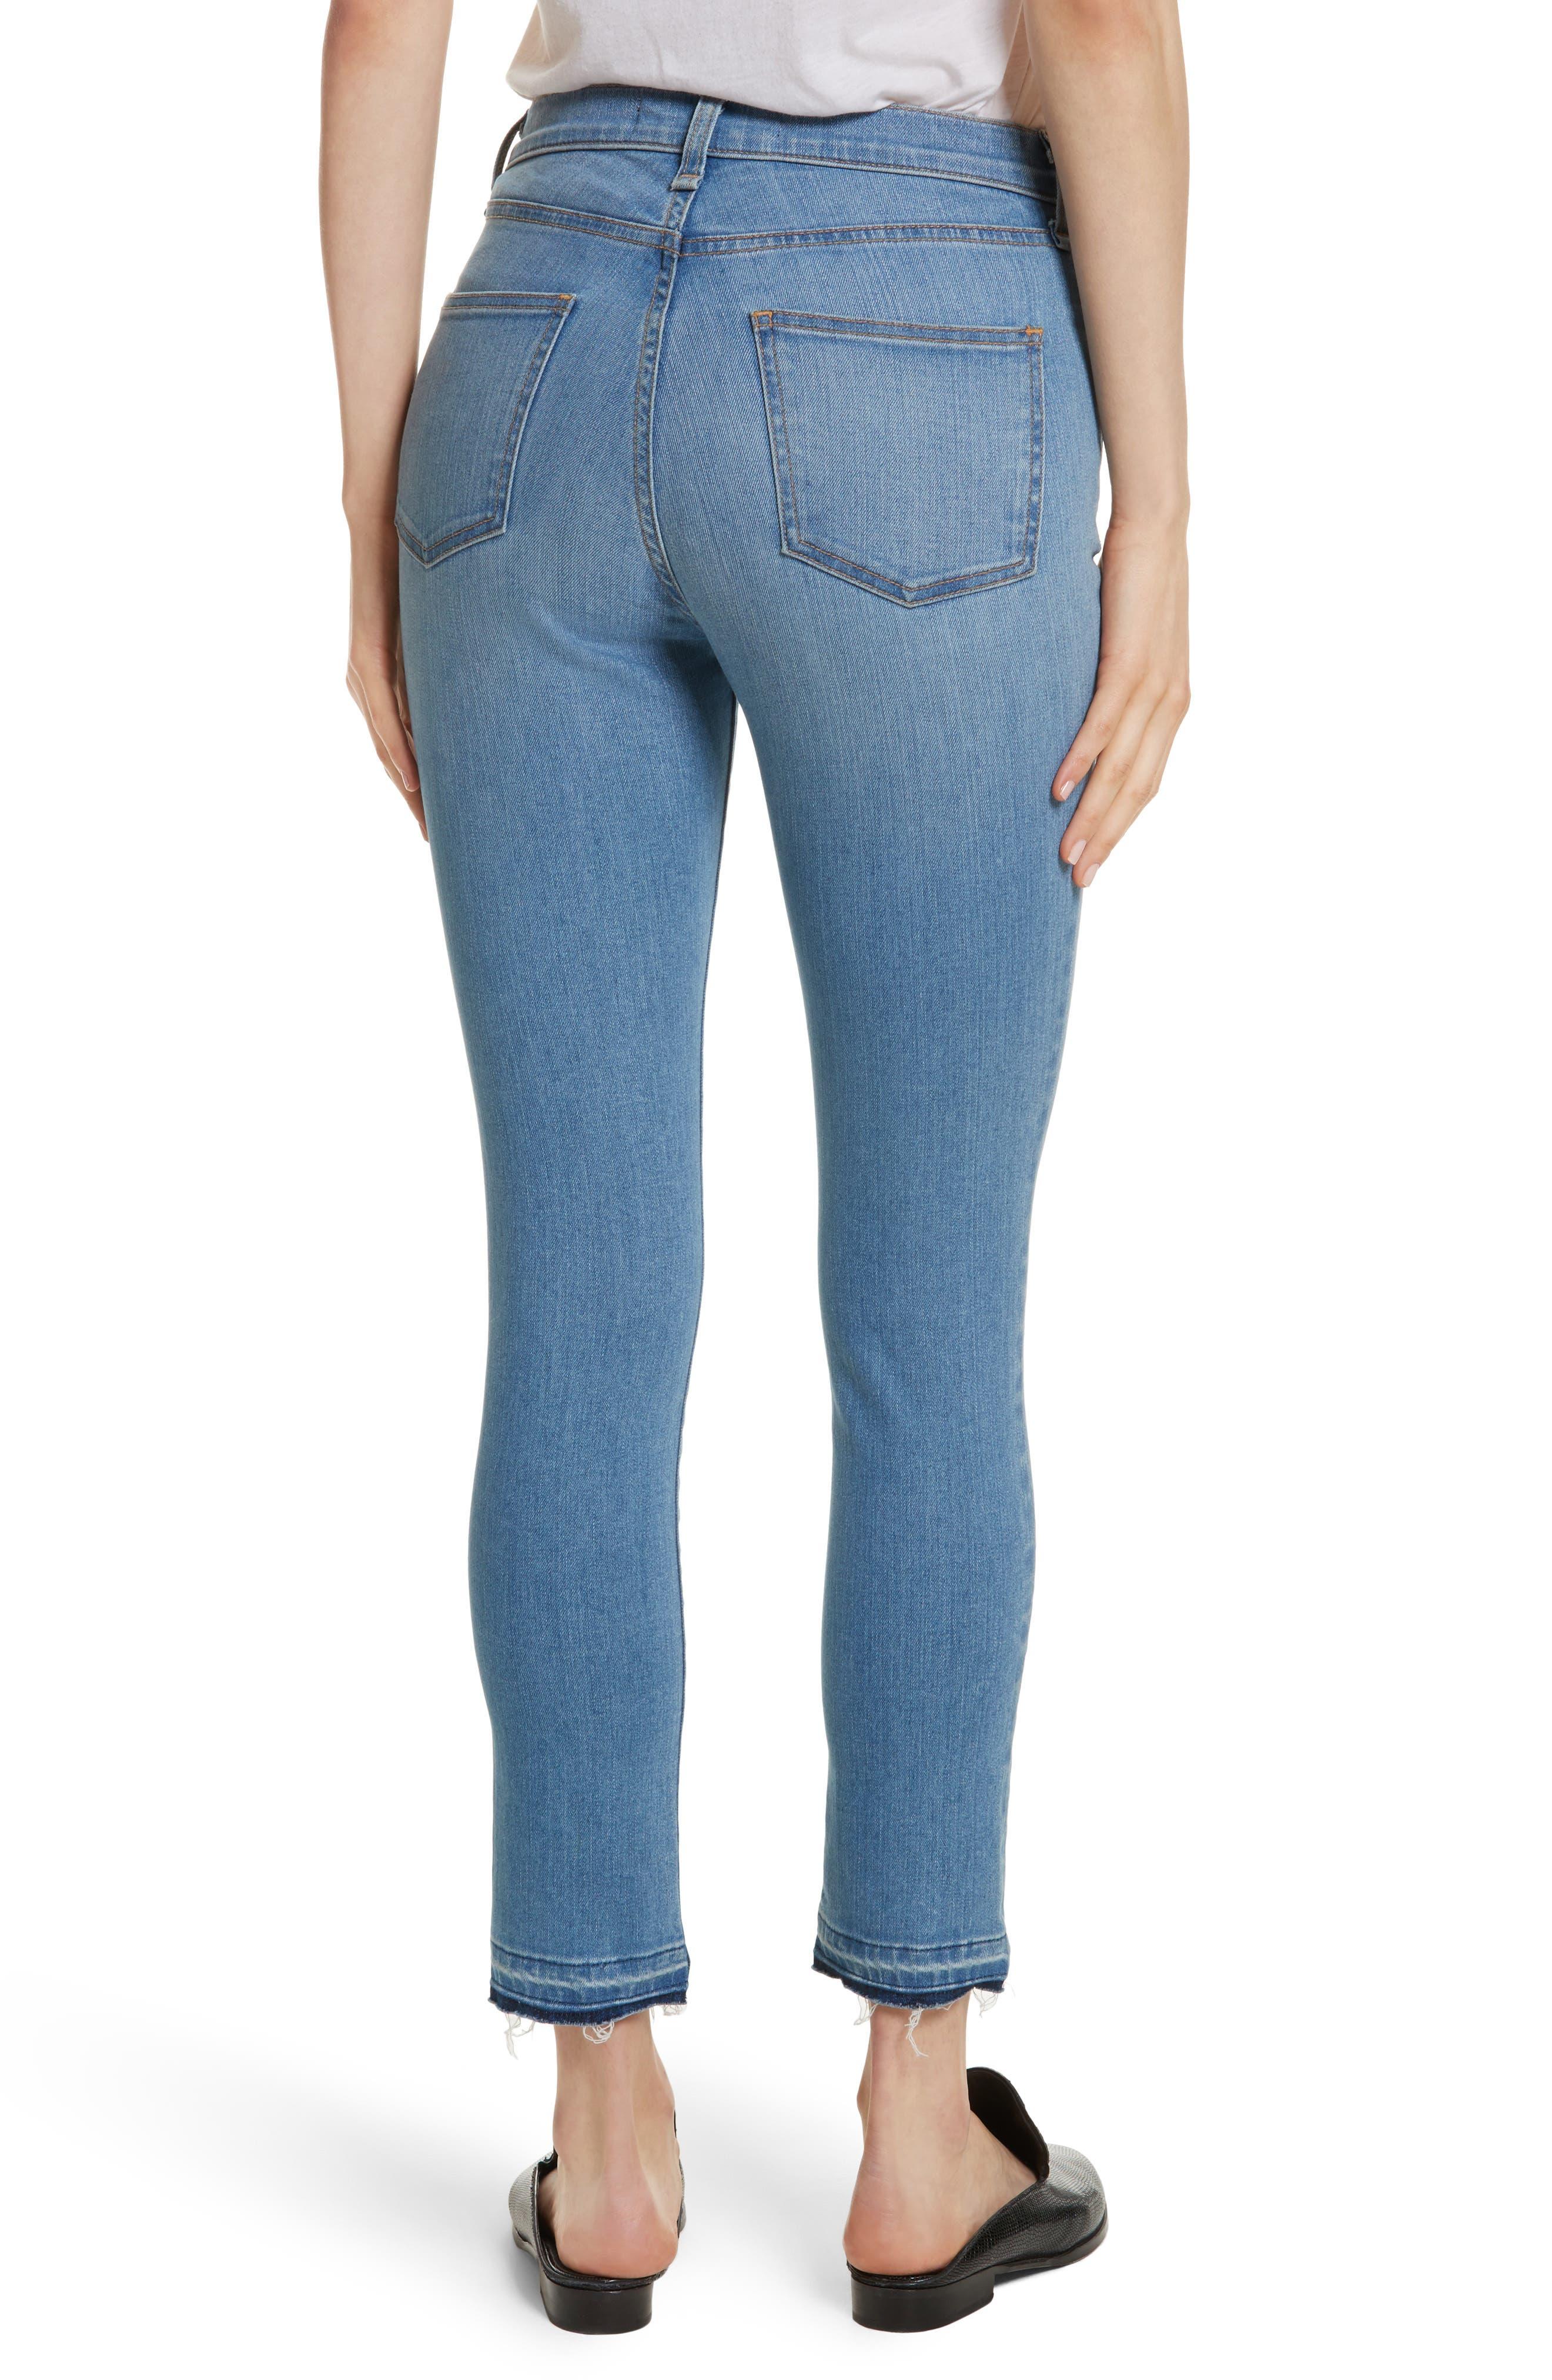 Debbie High Waist Fray Hem Jeans,                             Alternate thumbnail 2, color,                             Retro Blue